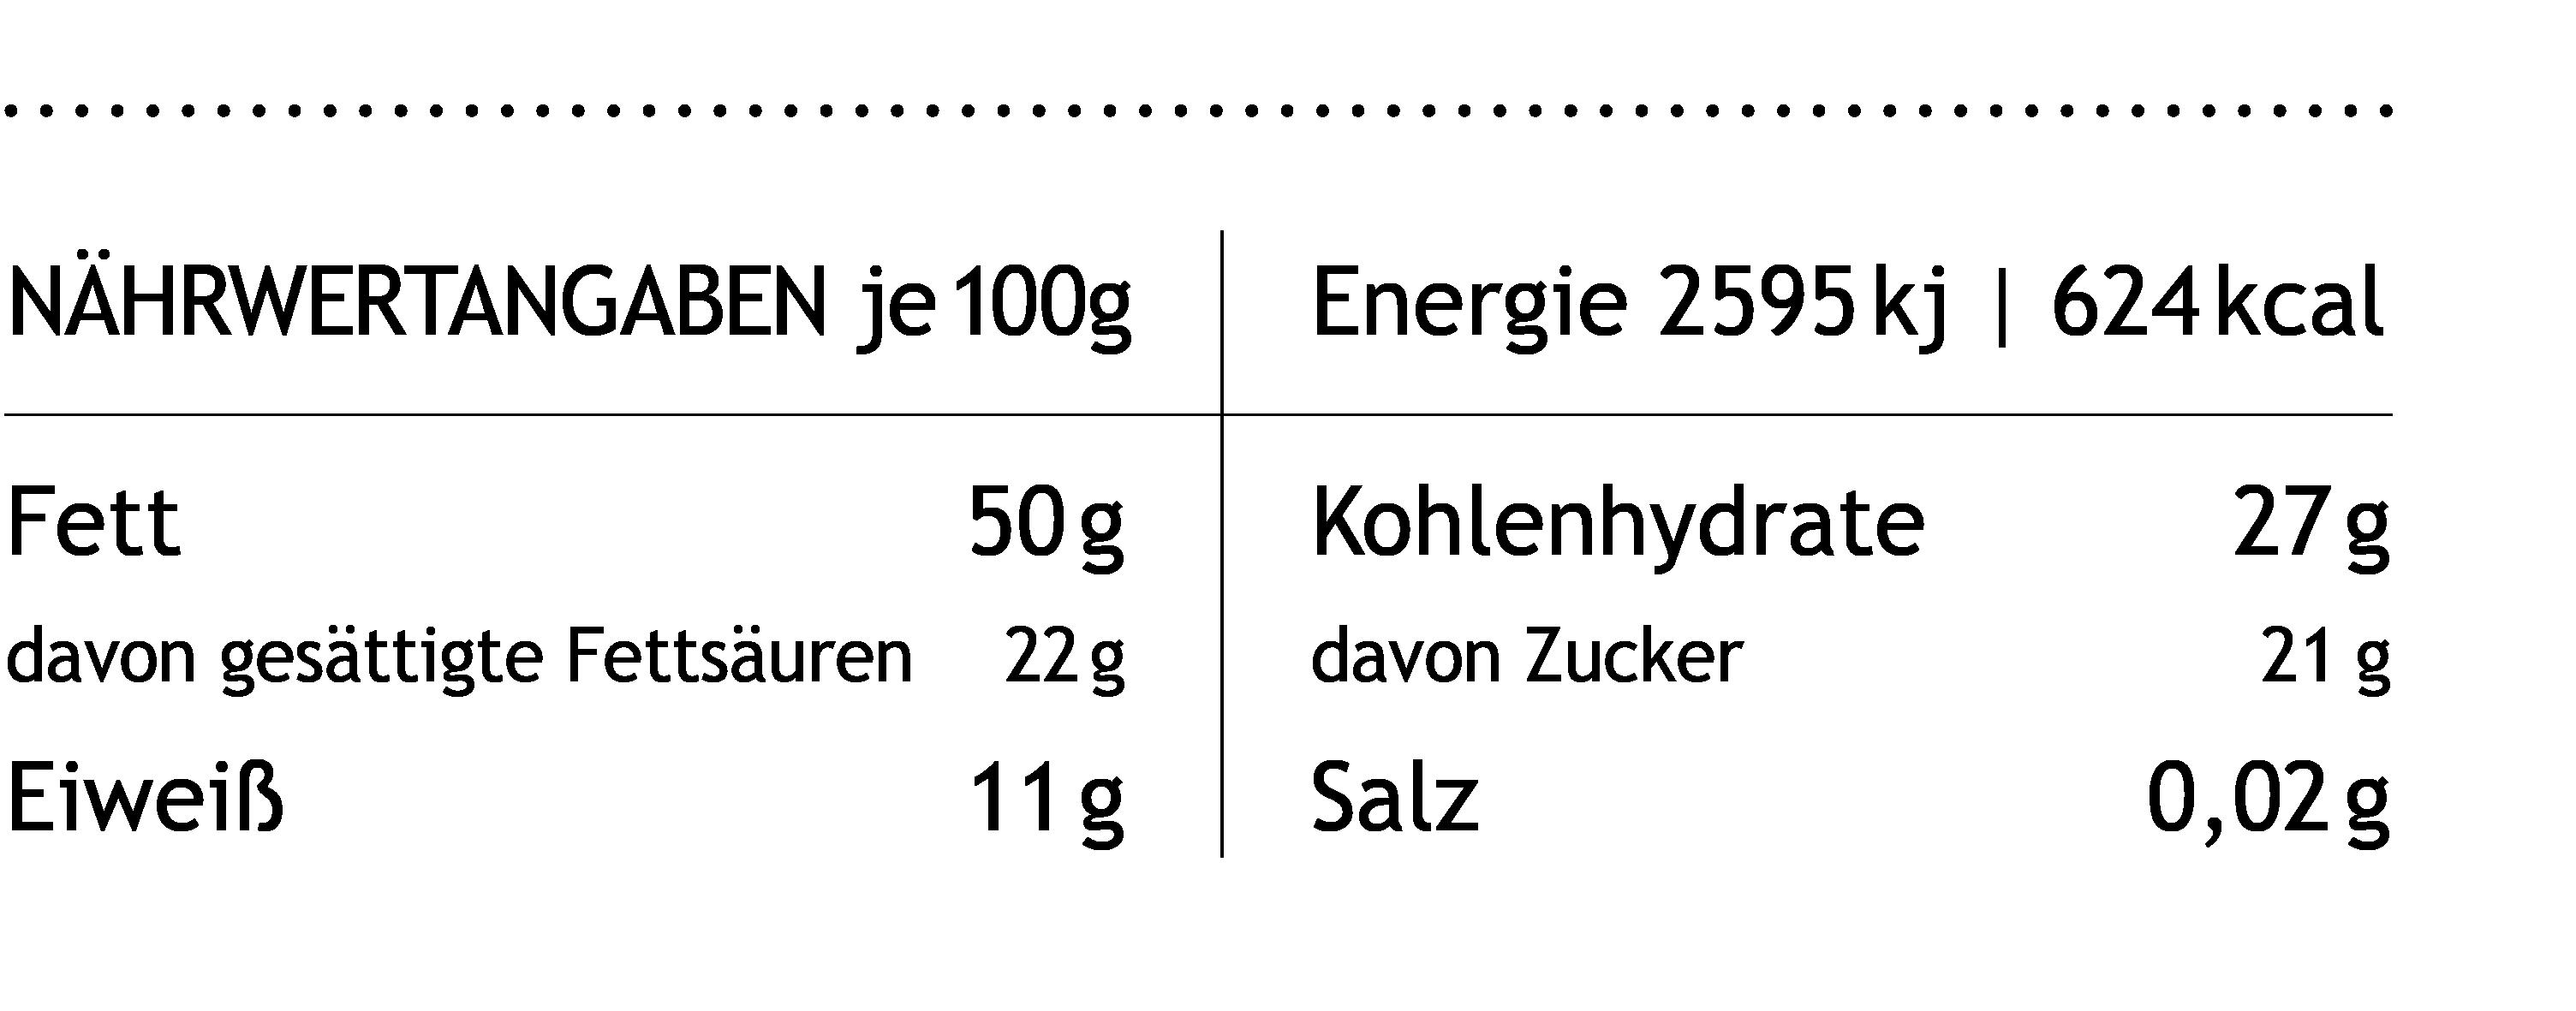 NW_Webshop_Tafeln_Dunkle_3_N-sse_f-r_Aschenbr-del